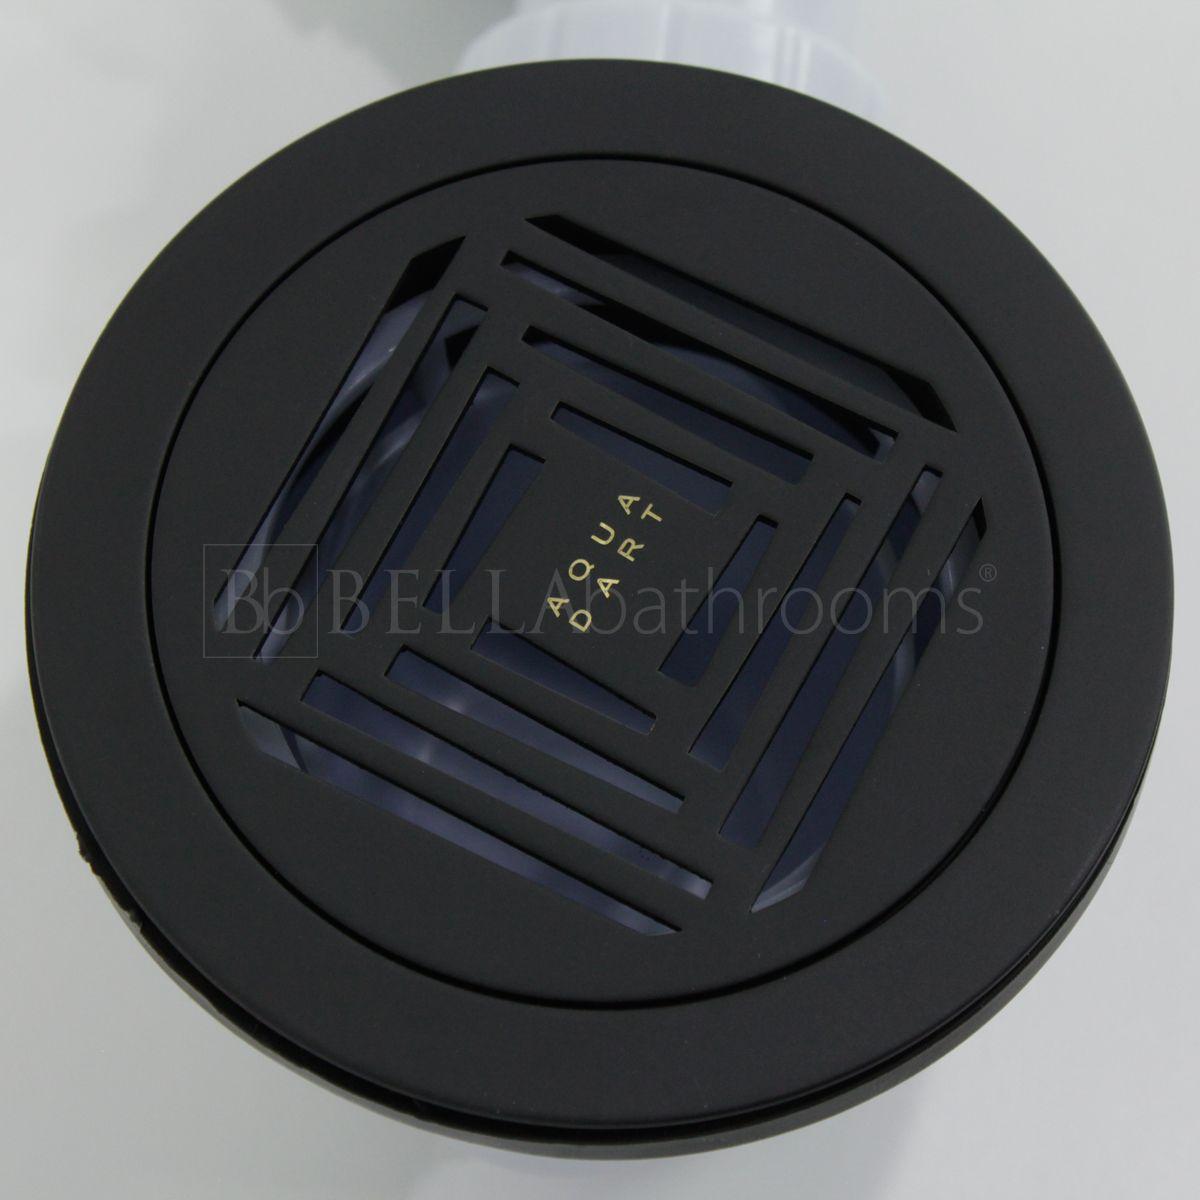 Aquadart 90mm Shower Waste with Black Grate Top